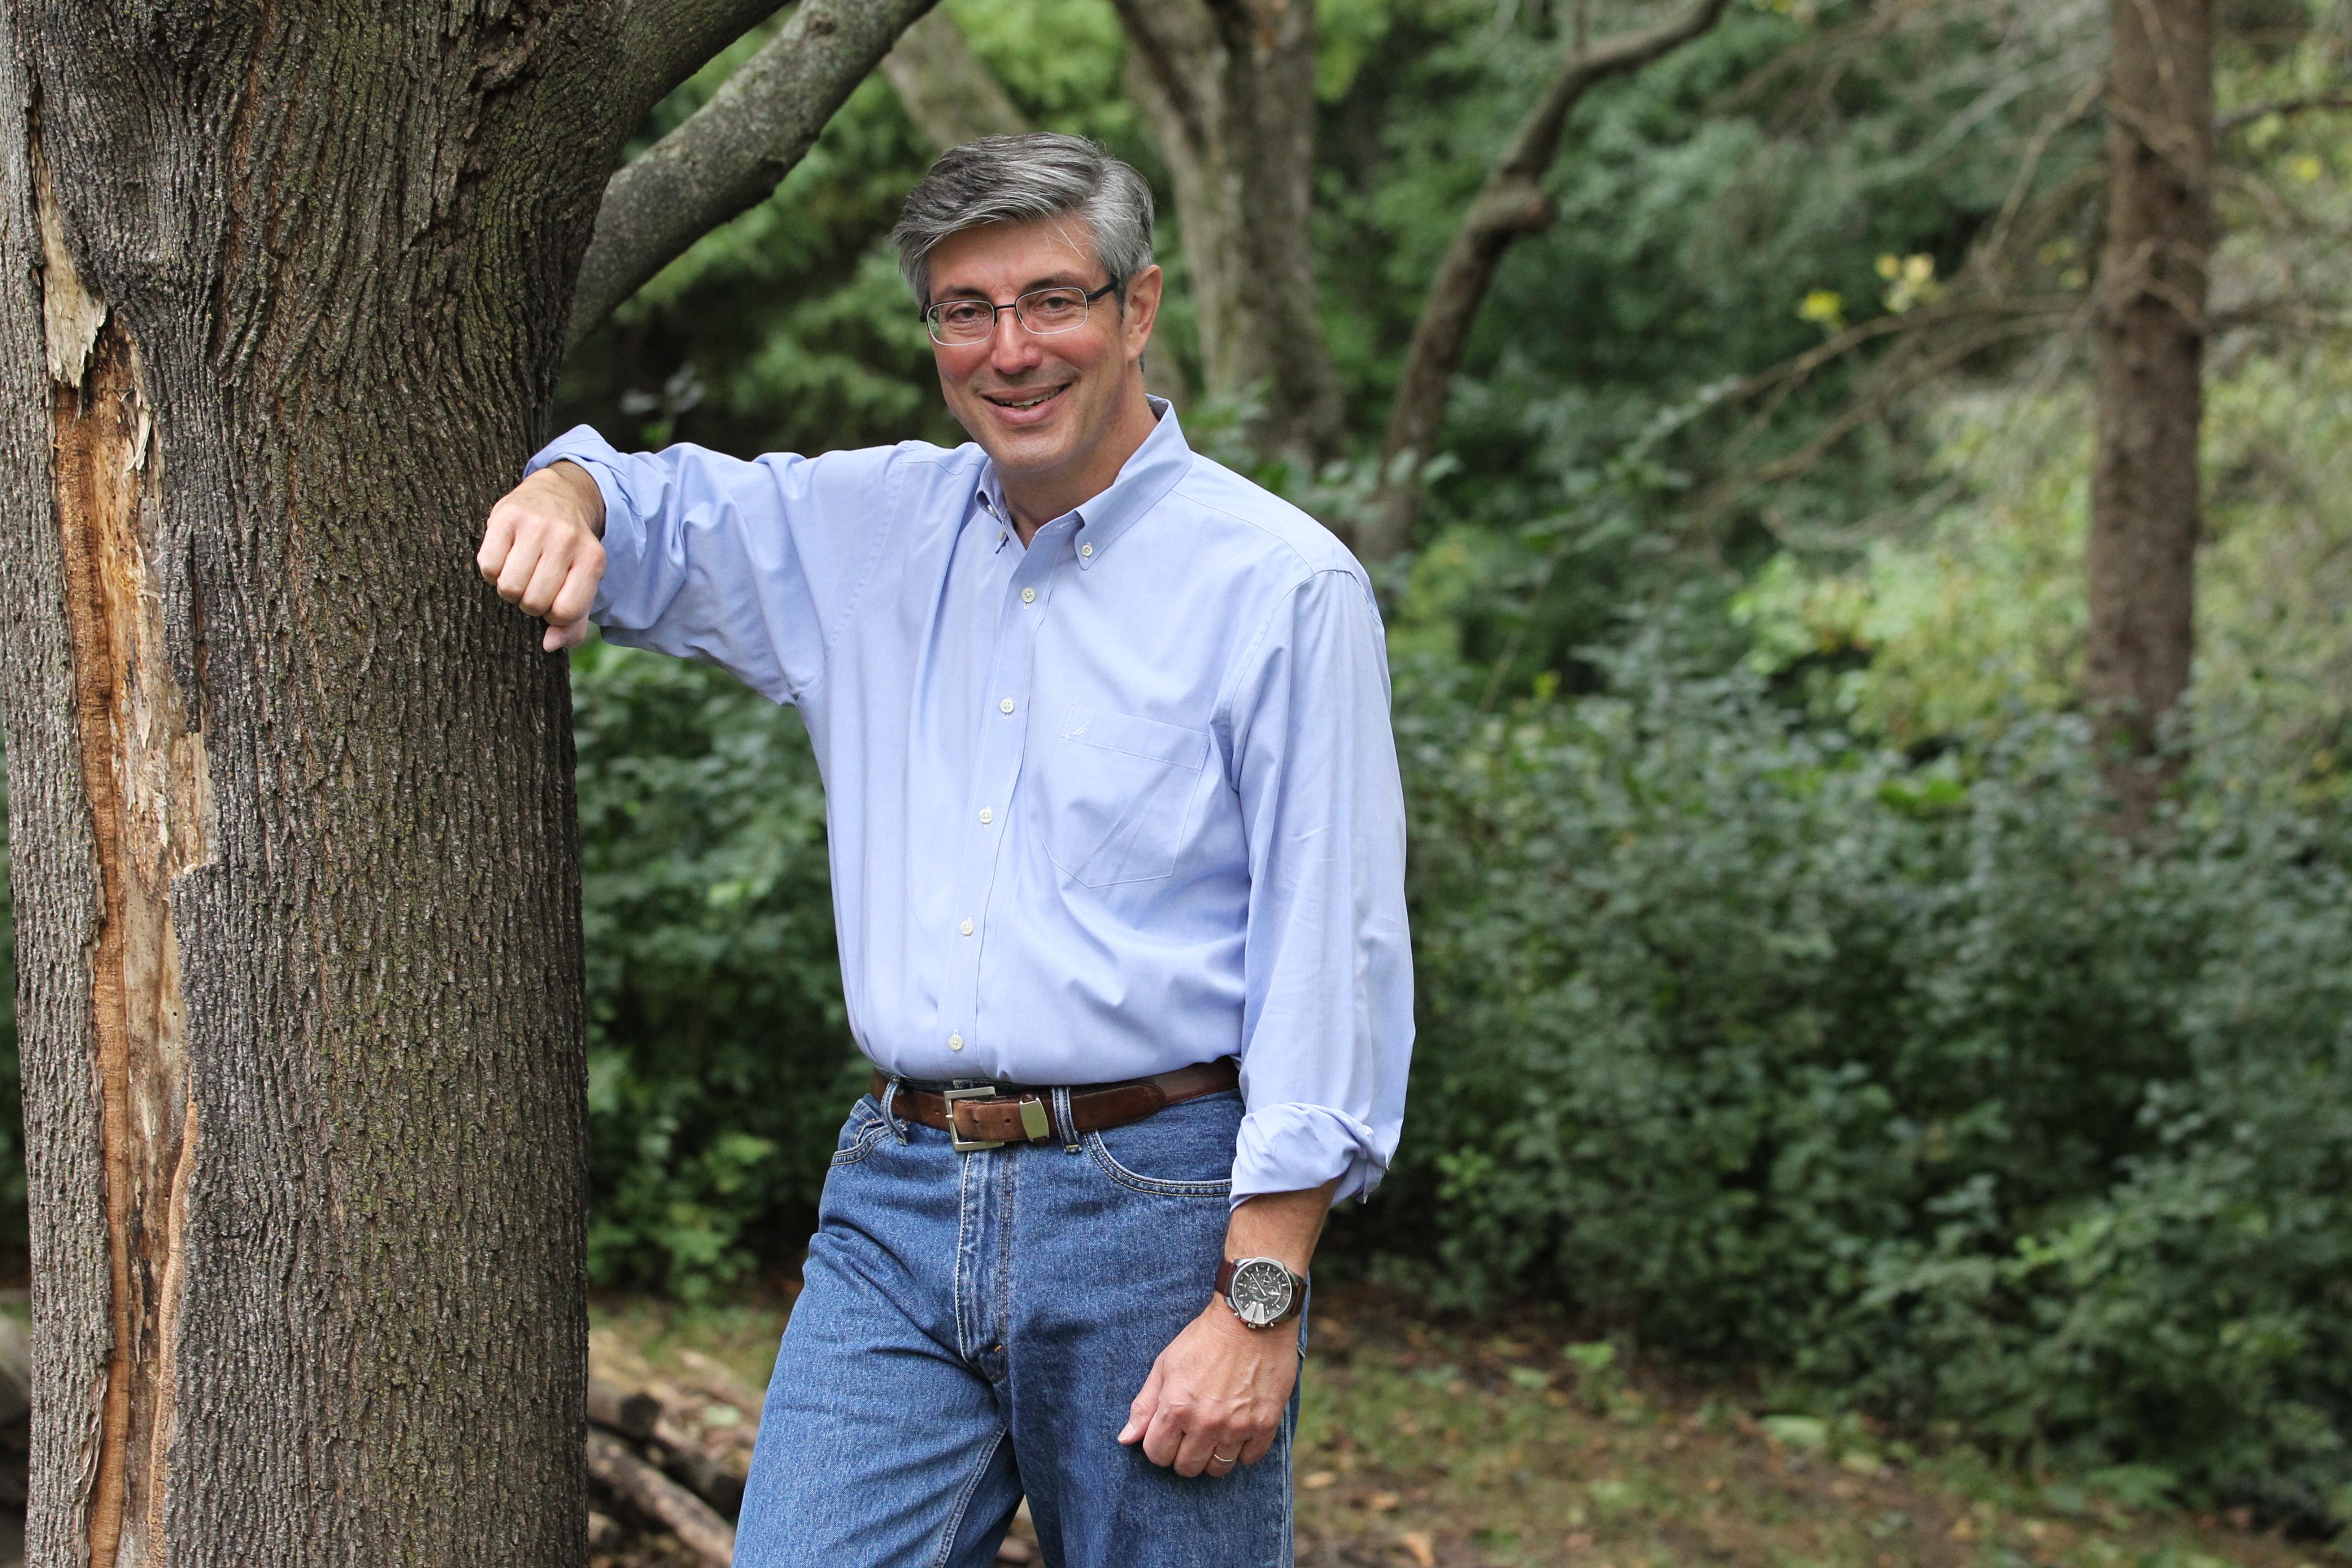 Dan Ugaste, Illinois House 65th District Republican nominee profile, 2020 election candidate questionnaire